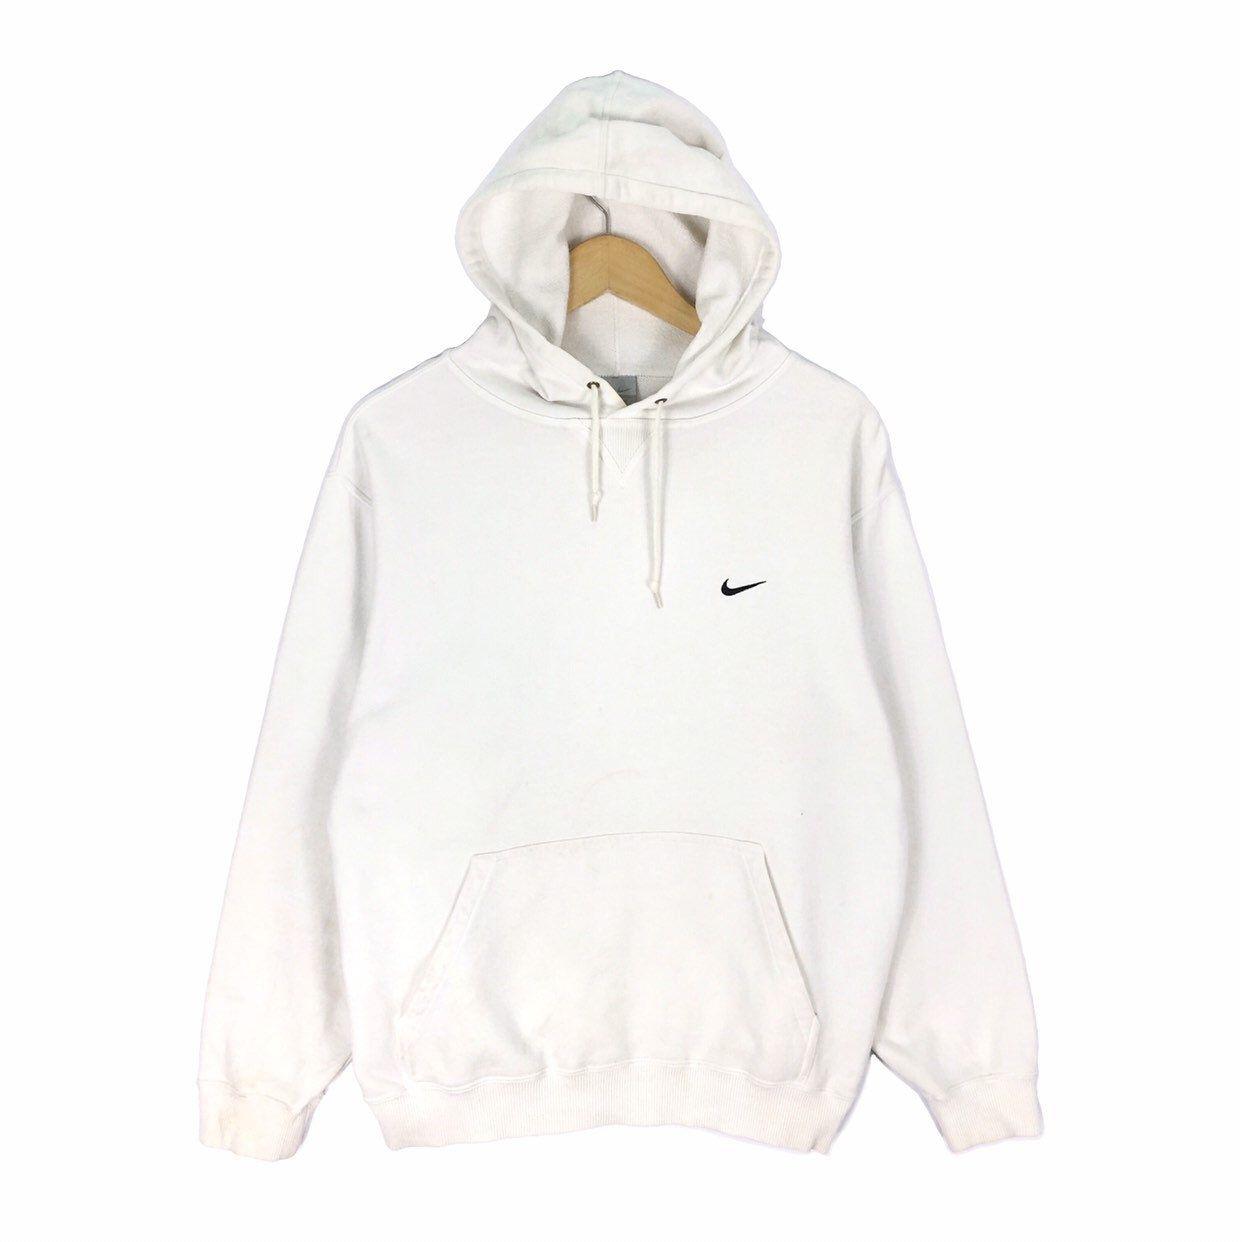 quite nice new photos arrives Vintage Nike Swoosh Small Logo Hoodie Sweatshirt Embroidery ...